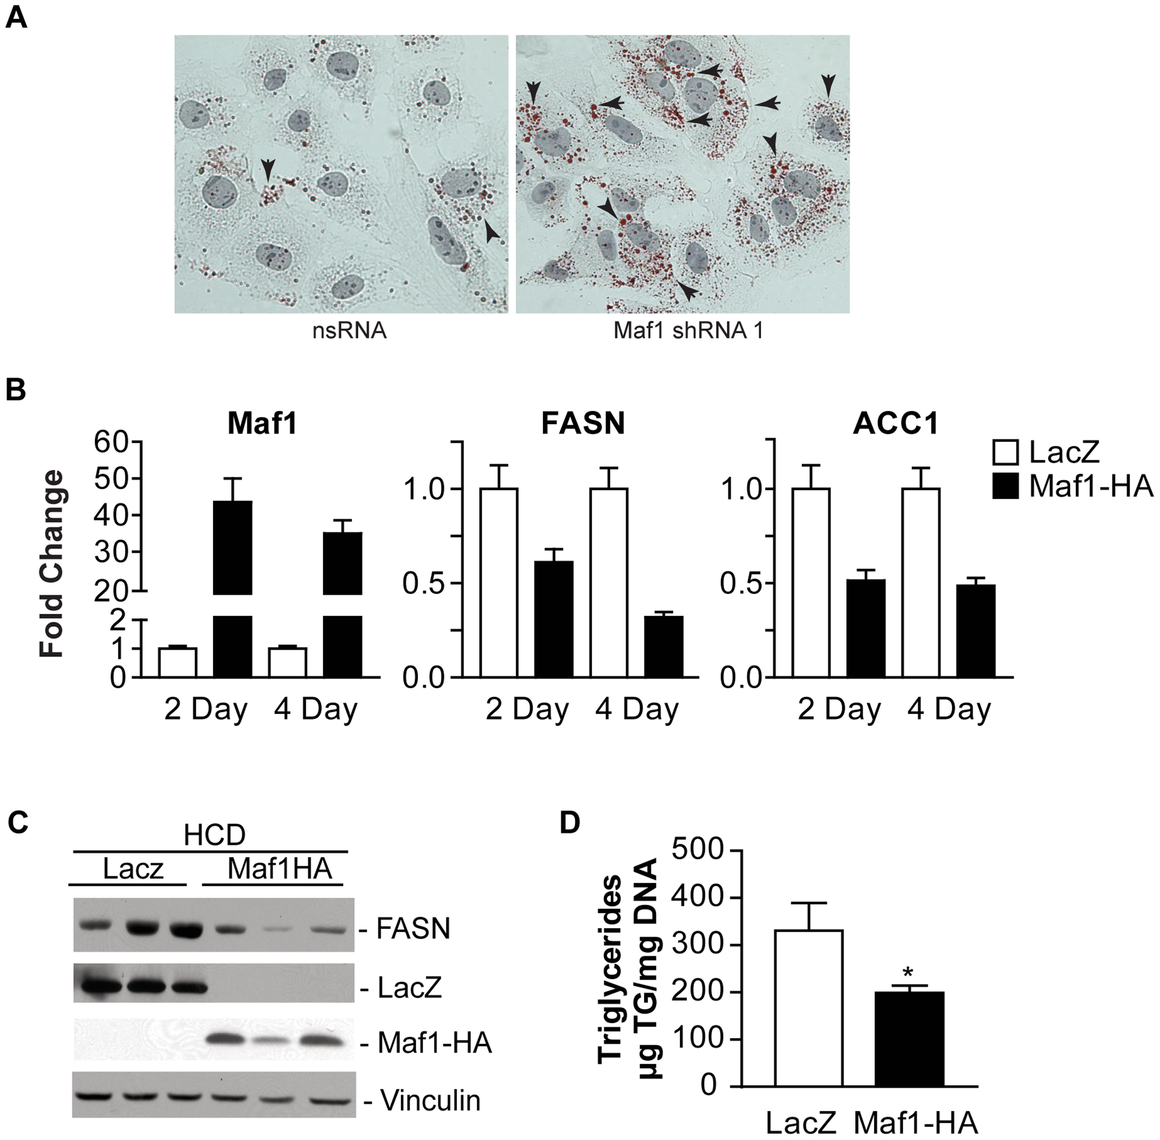 Maf1 controls intracellular lipid accumulation and de novo lipogenesis.